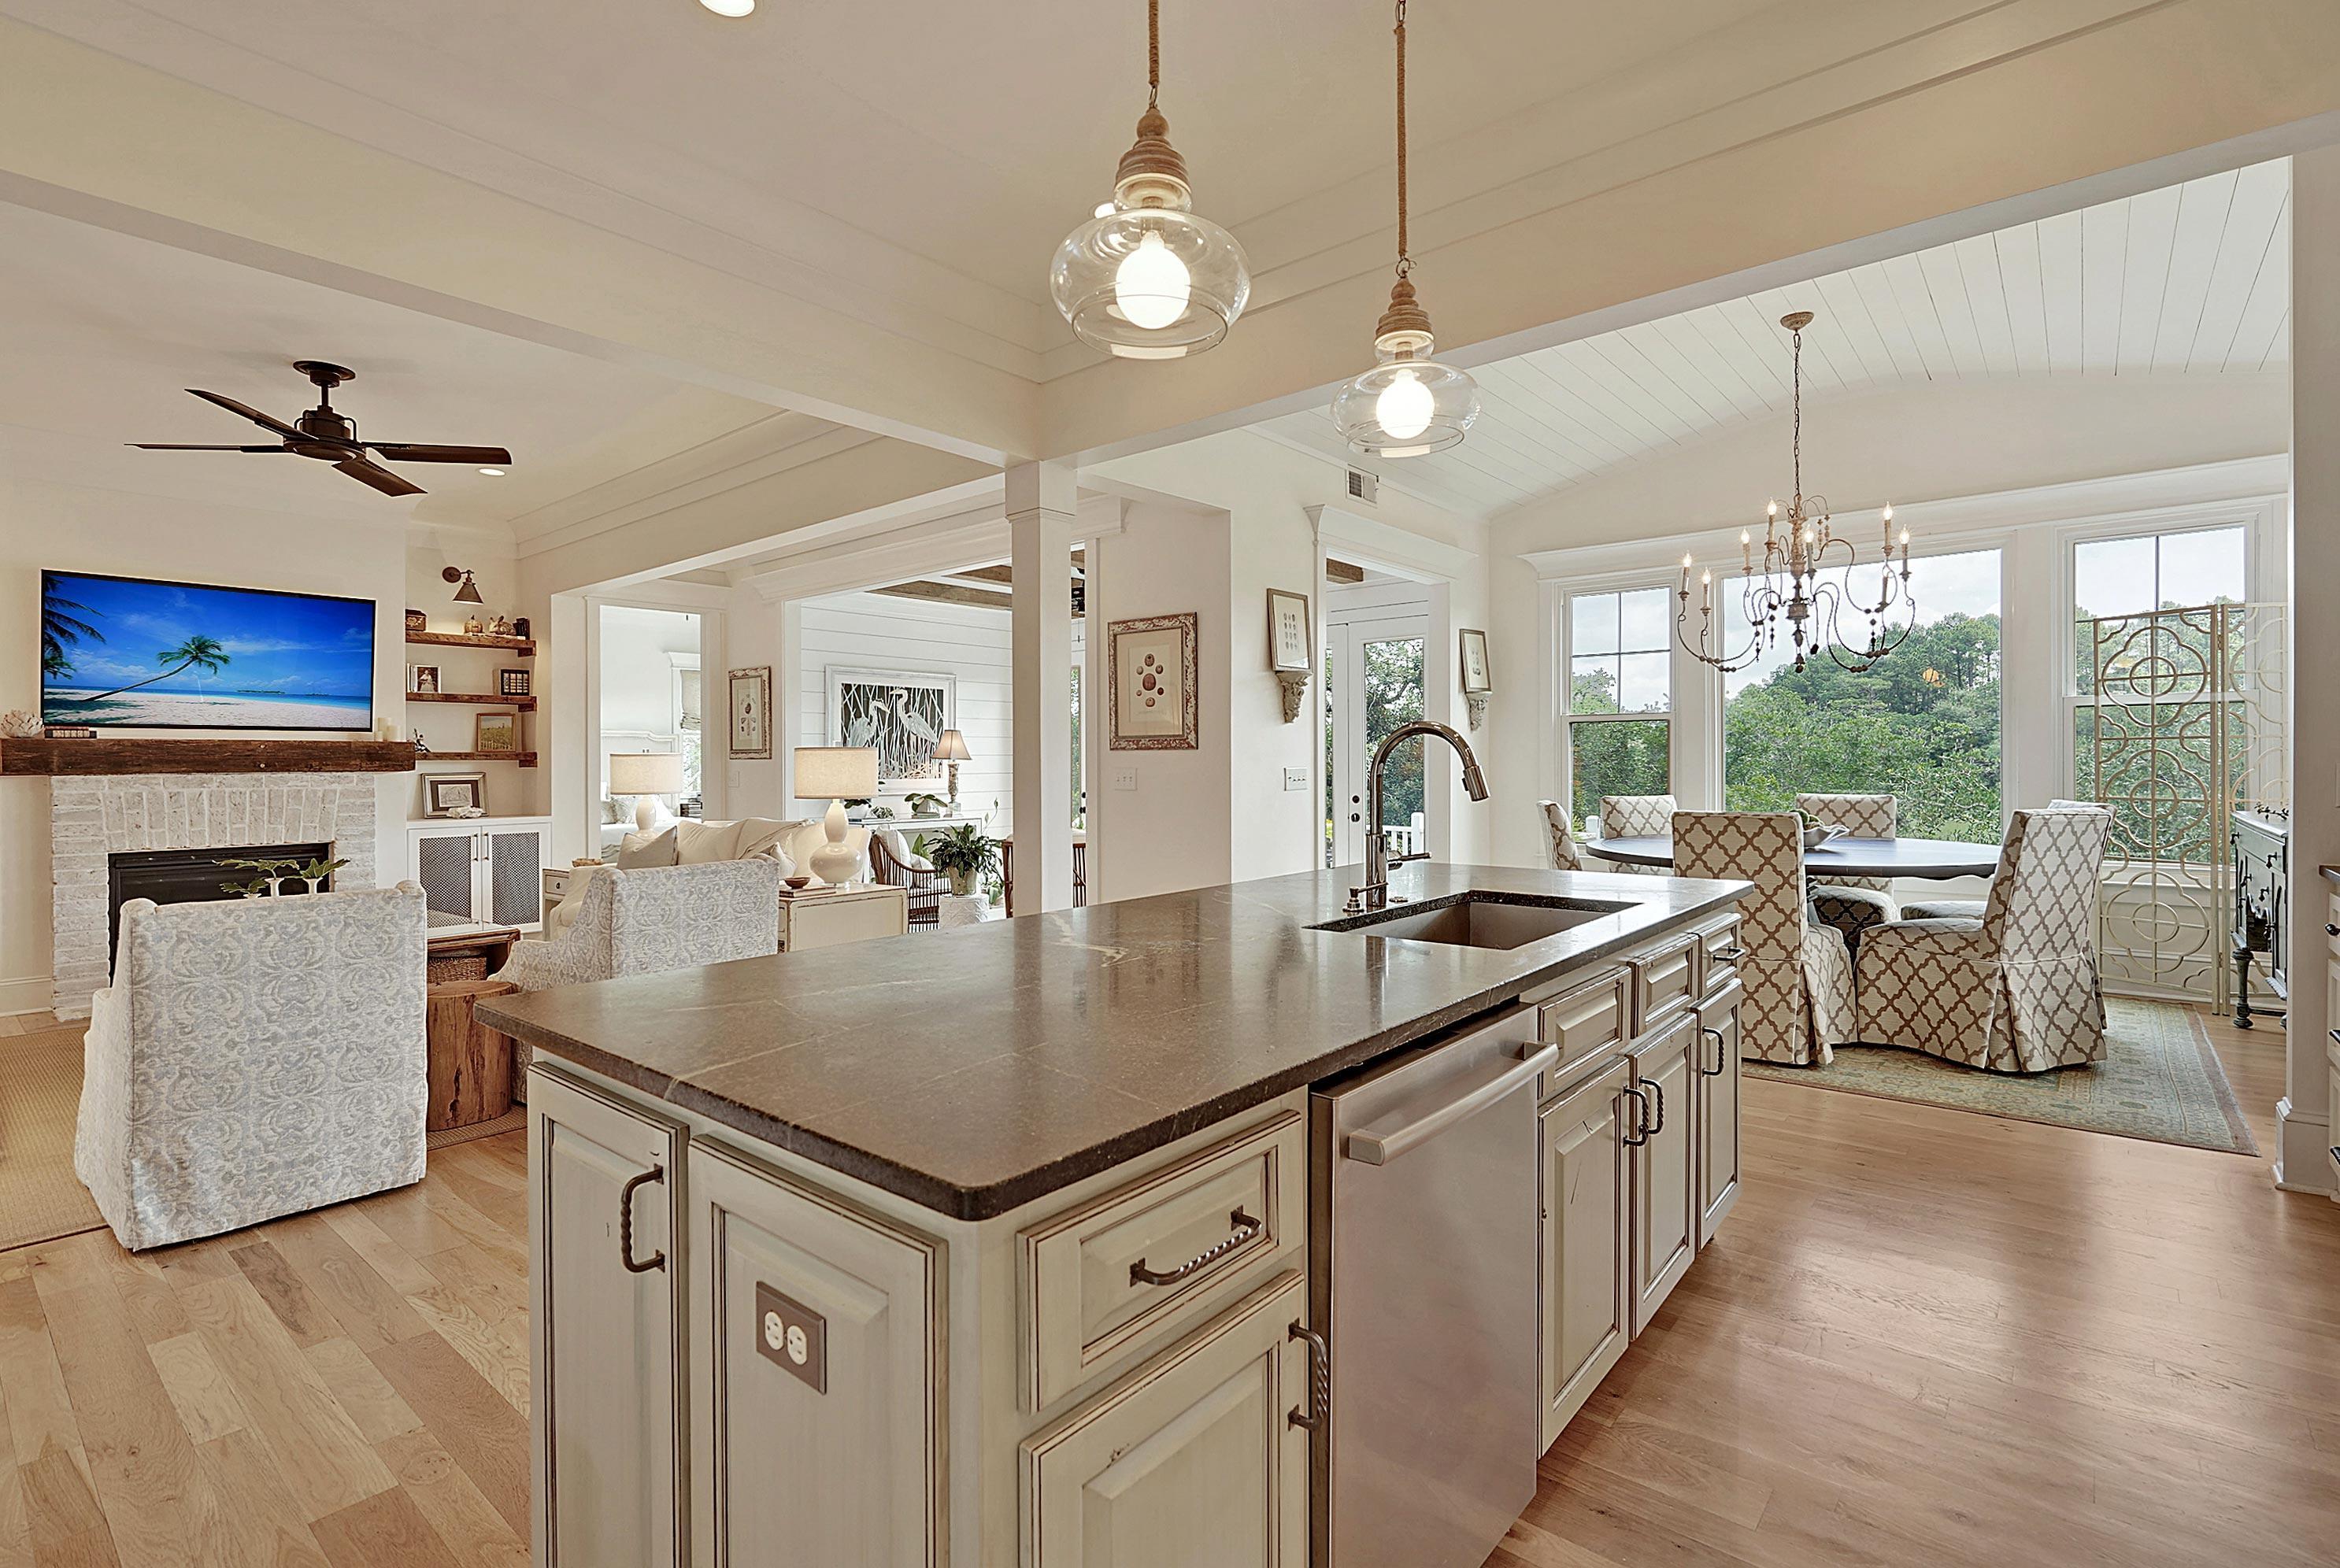 Grassy Creek Homes For Sale - 294 River Oak, Mount Pleasant, SC - 43